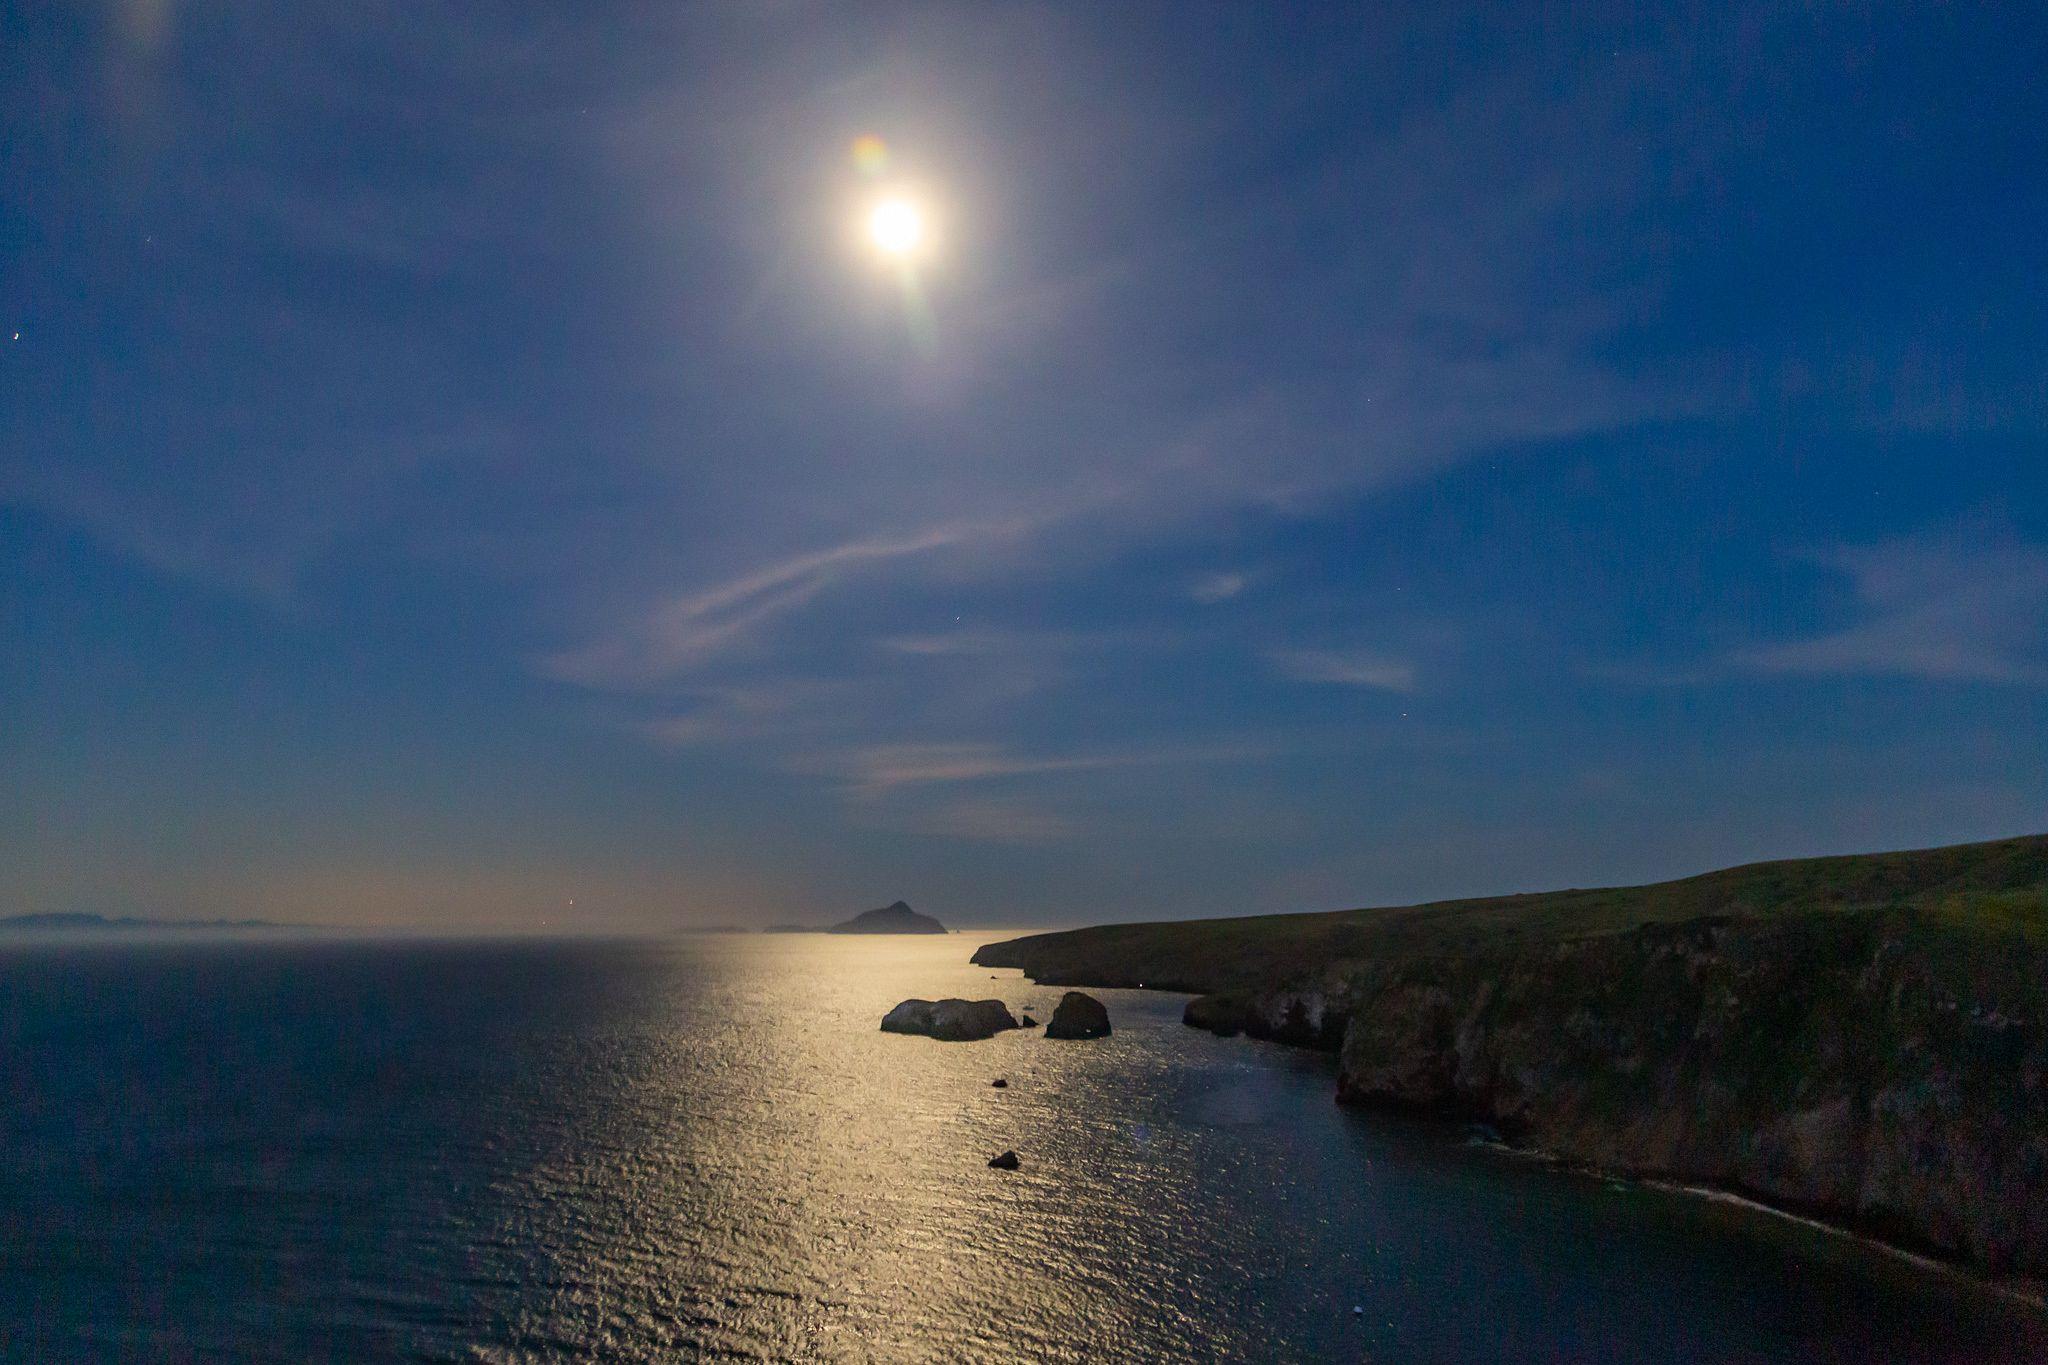 Full Moon on Channel Islands